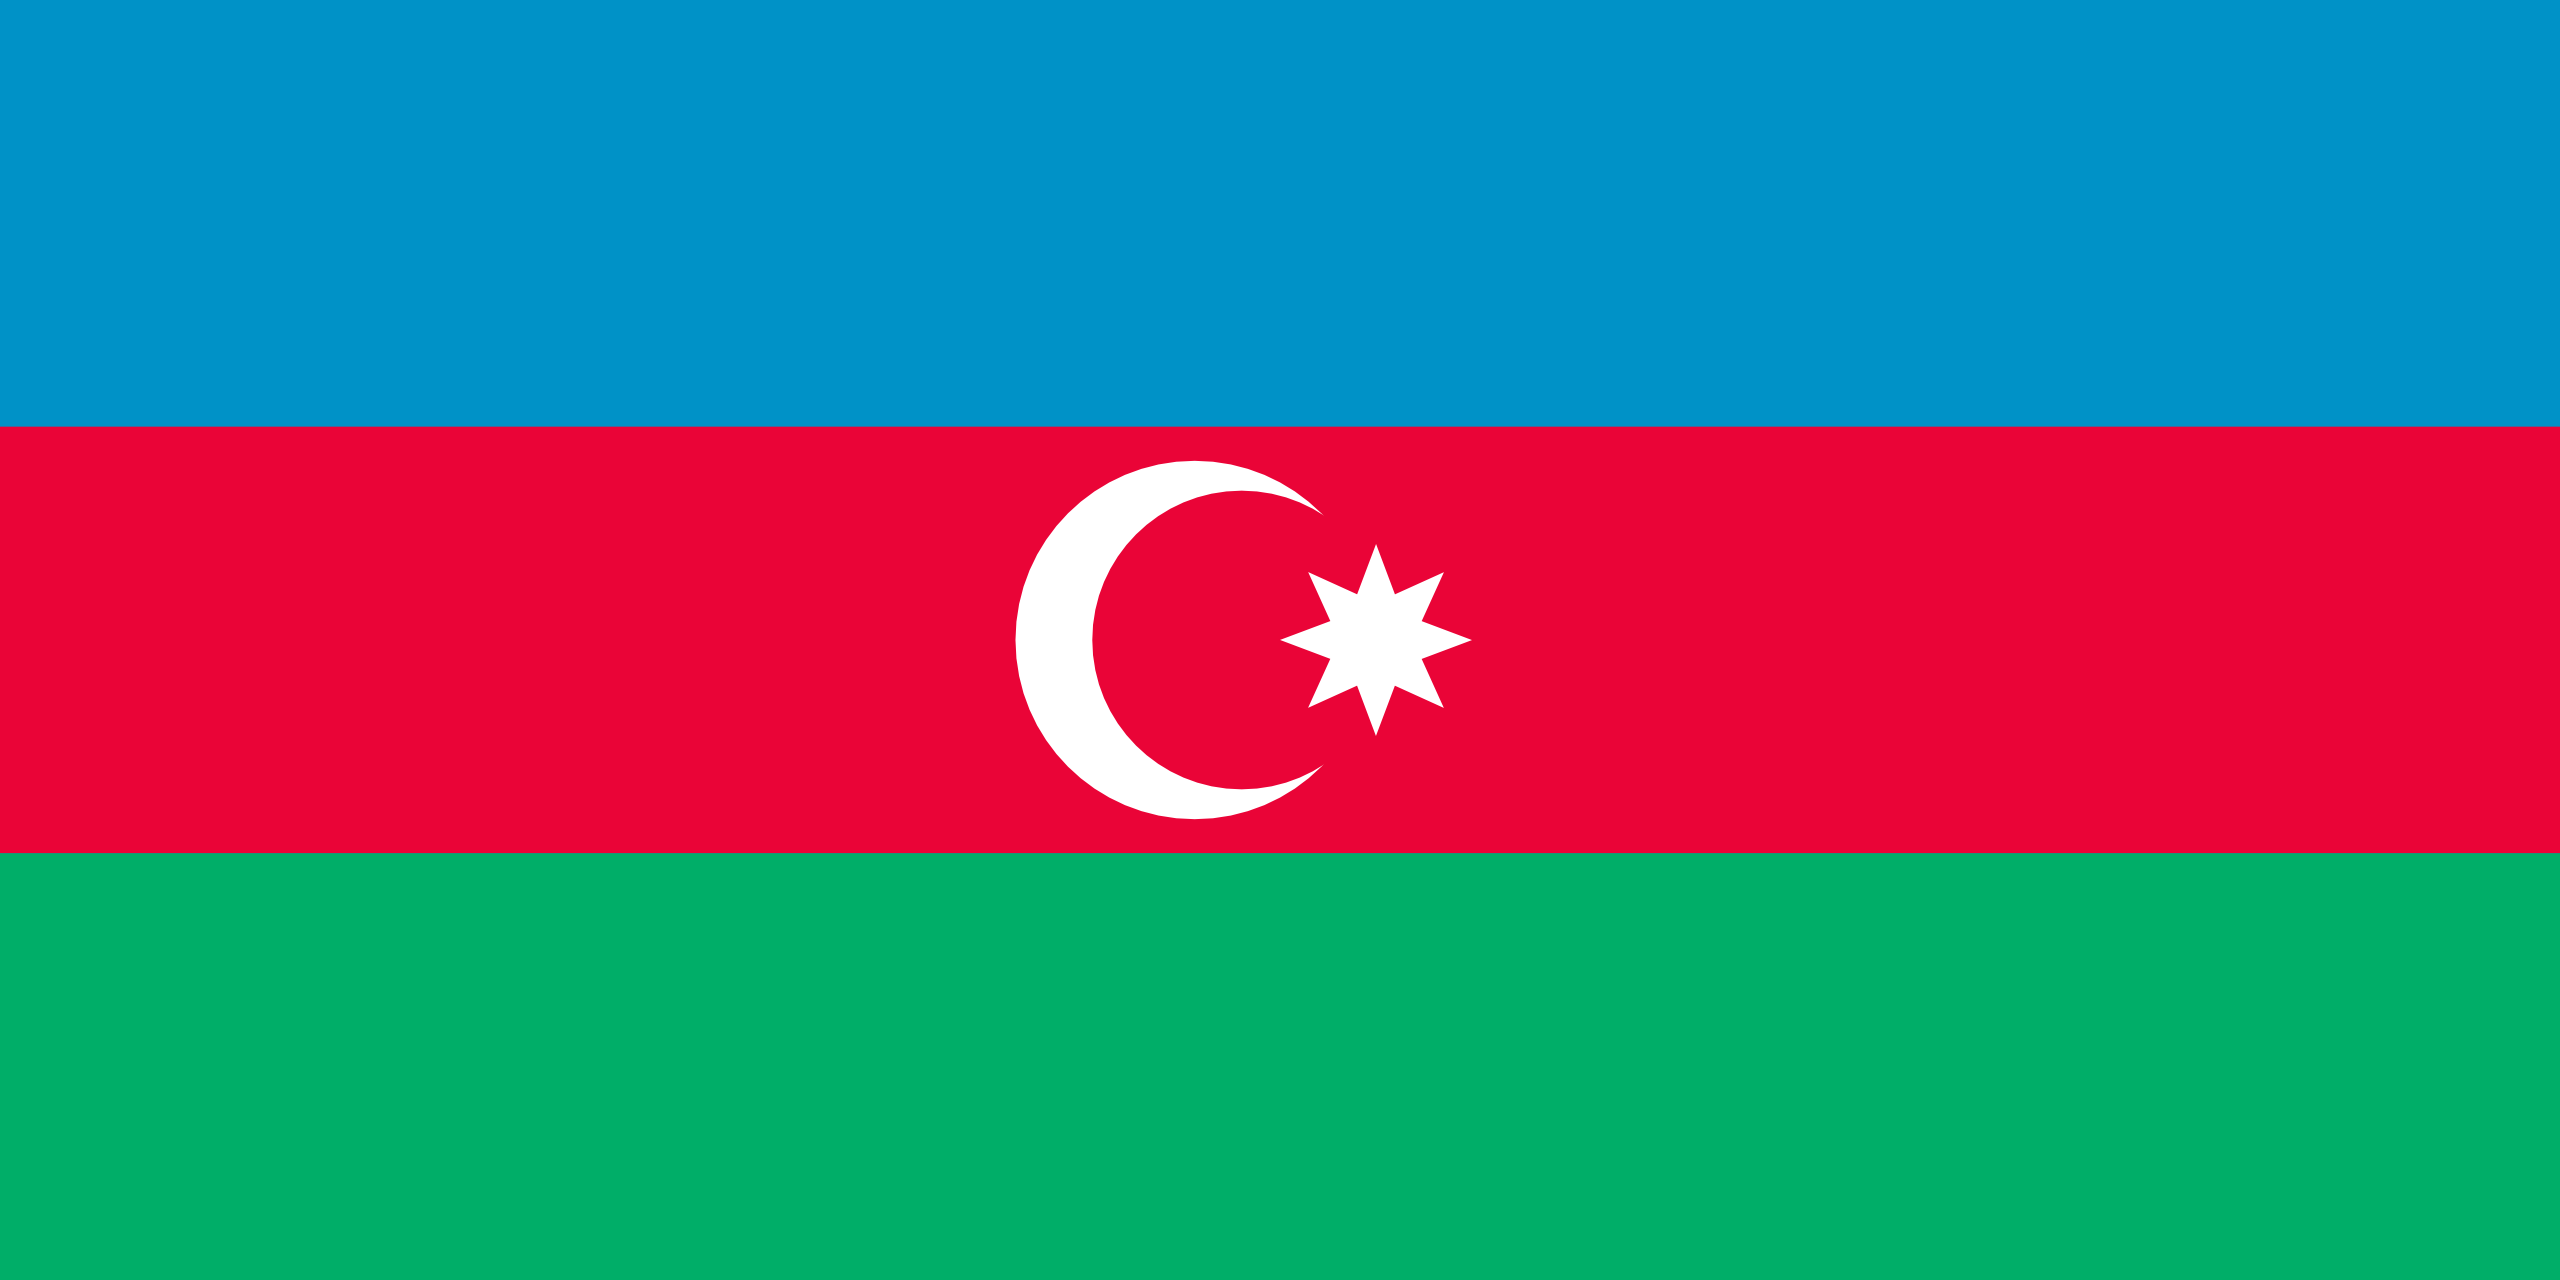 azerbaiyán, страна, Эмблема, логотип, символ - Обои HD - Профессор falken.com